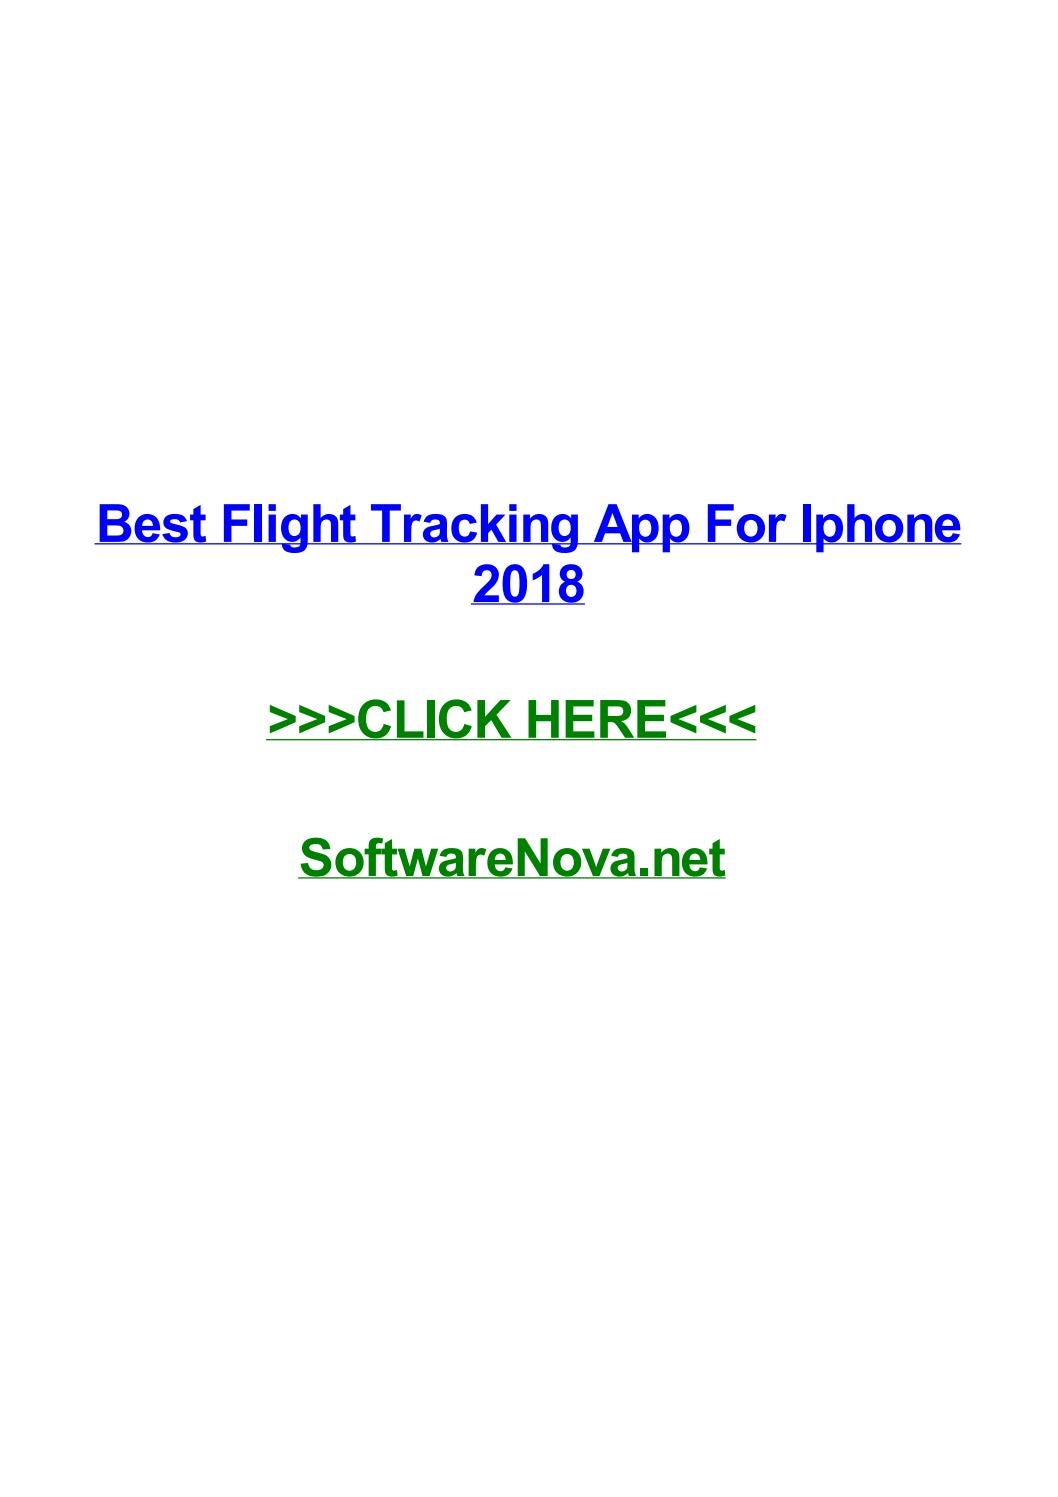 Best flight tracking app for iphone 2018 by doreenrjjr - issuu